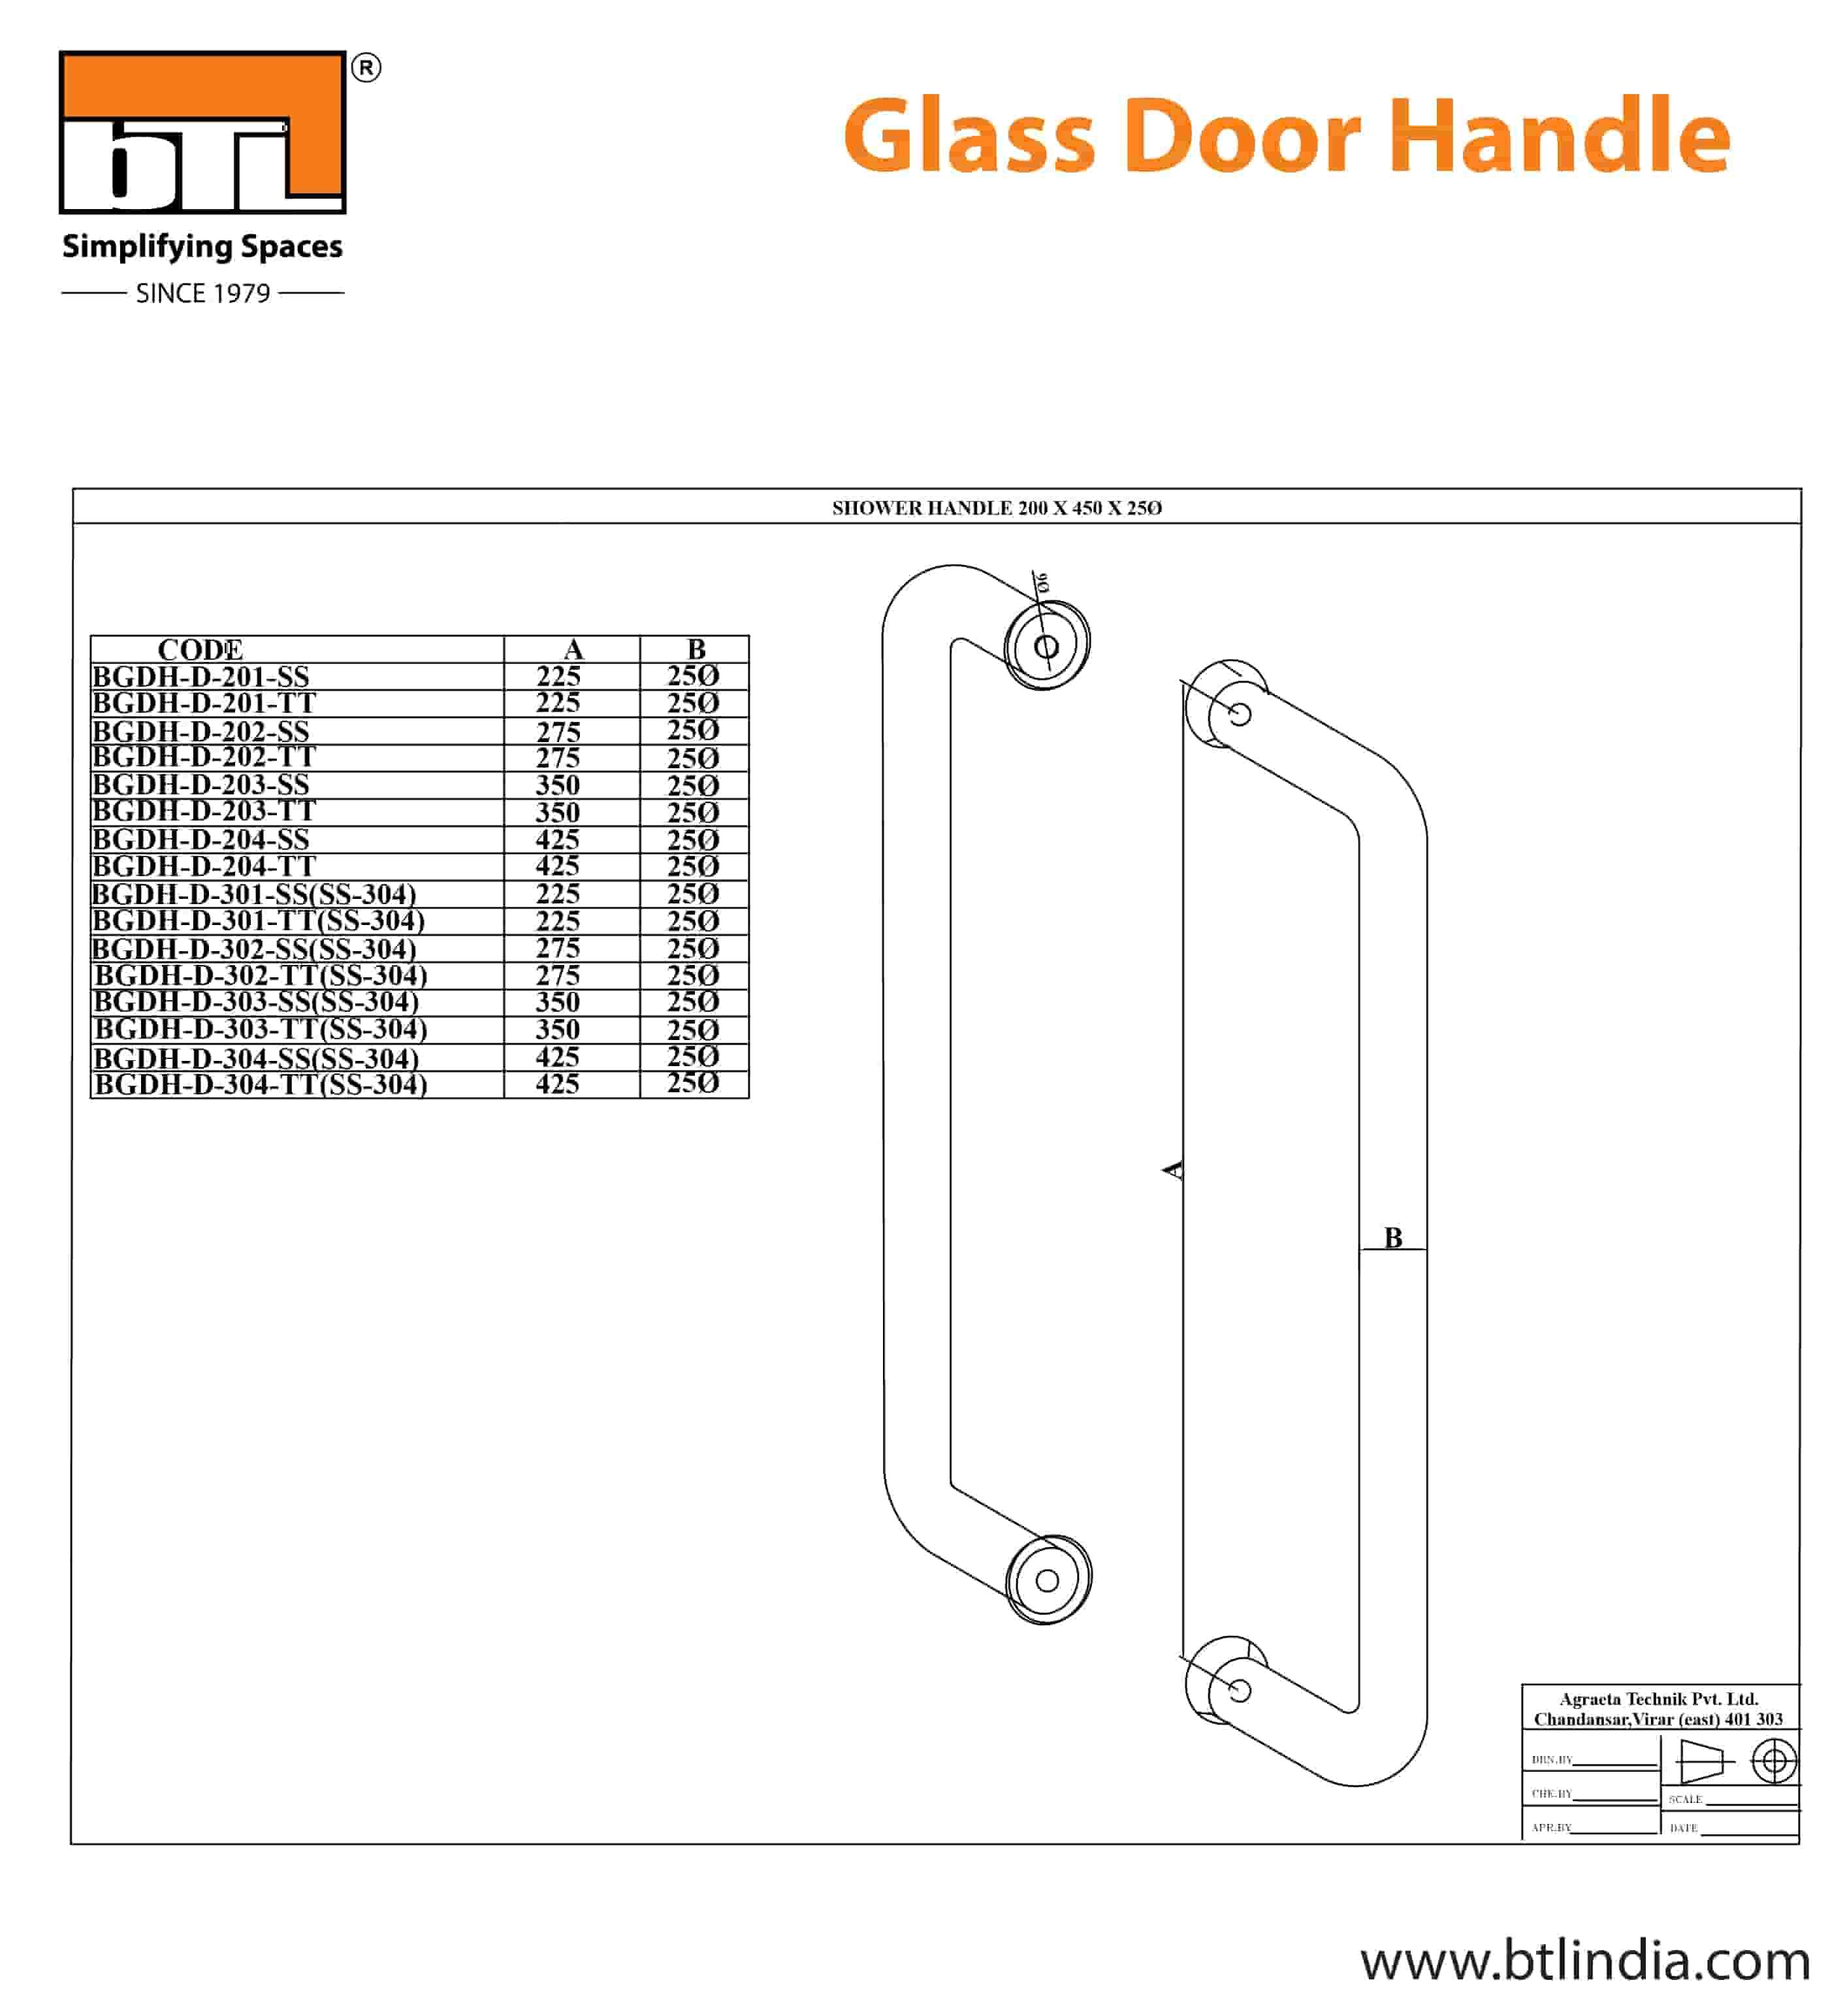 BTL BGDH-D-301-SS-SS304 Glass Door Handle SS - SS304 - 225x25 dia- Specifications